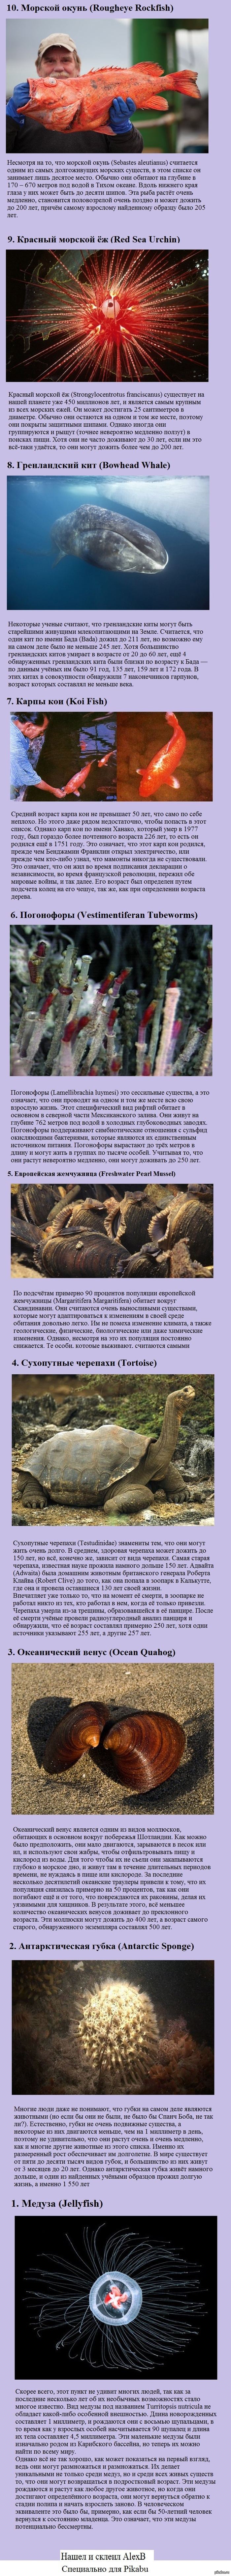 http://s.pikabu.ru/post_img/2013/05/05/6/1367739458_612286397.jpg